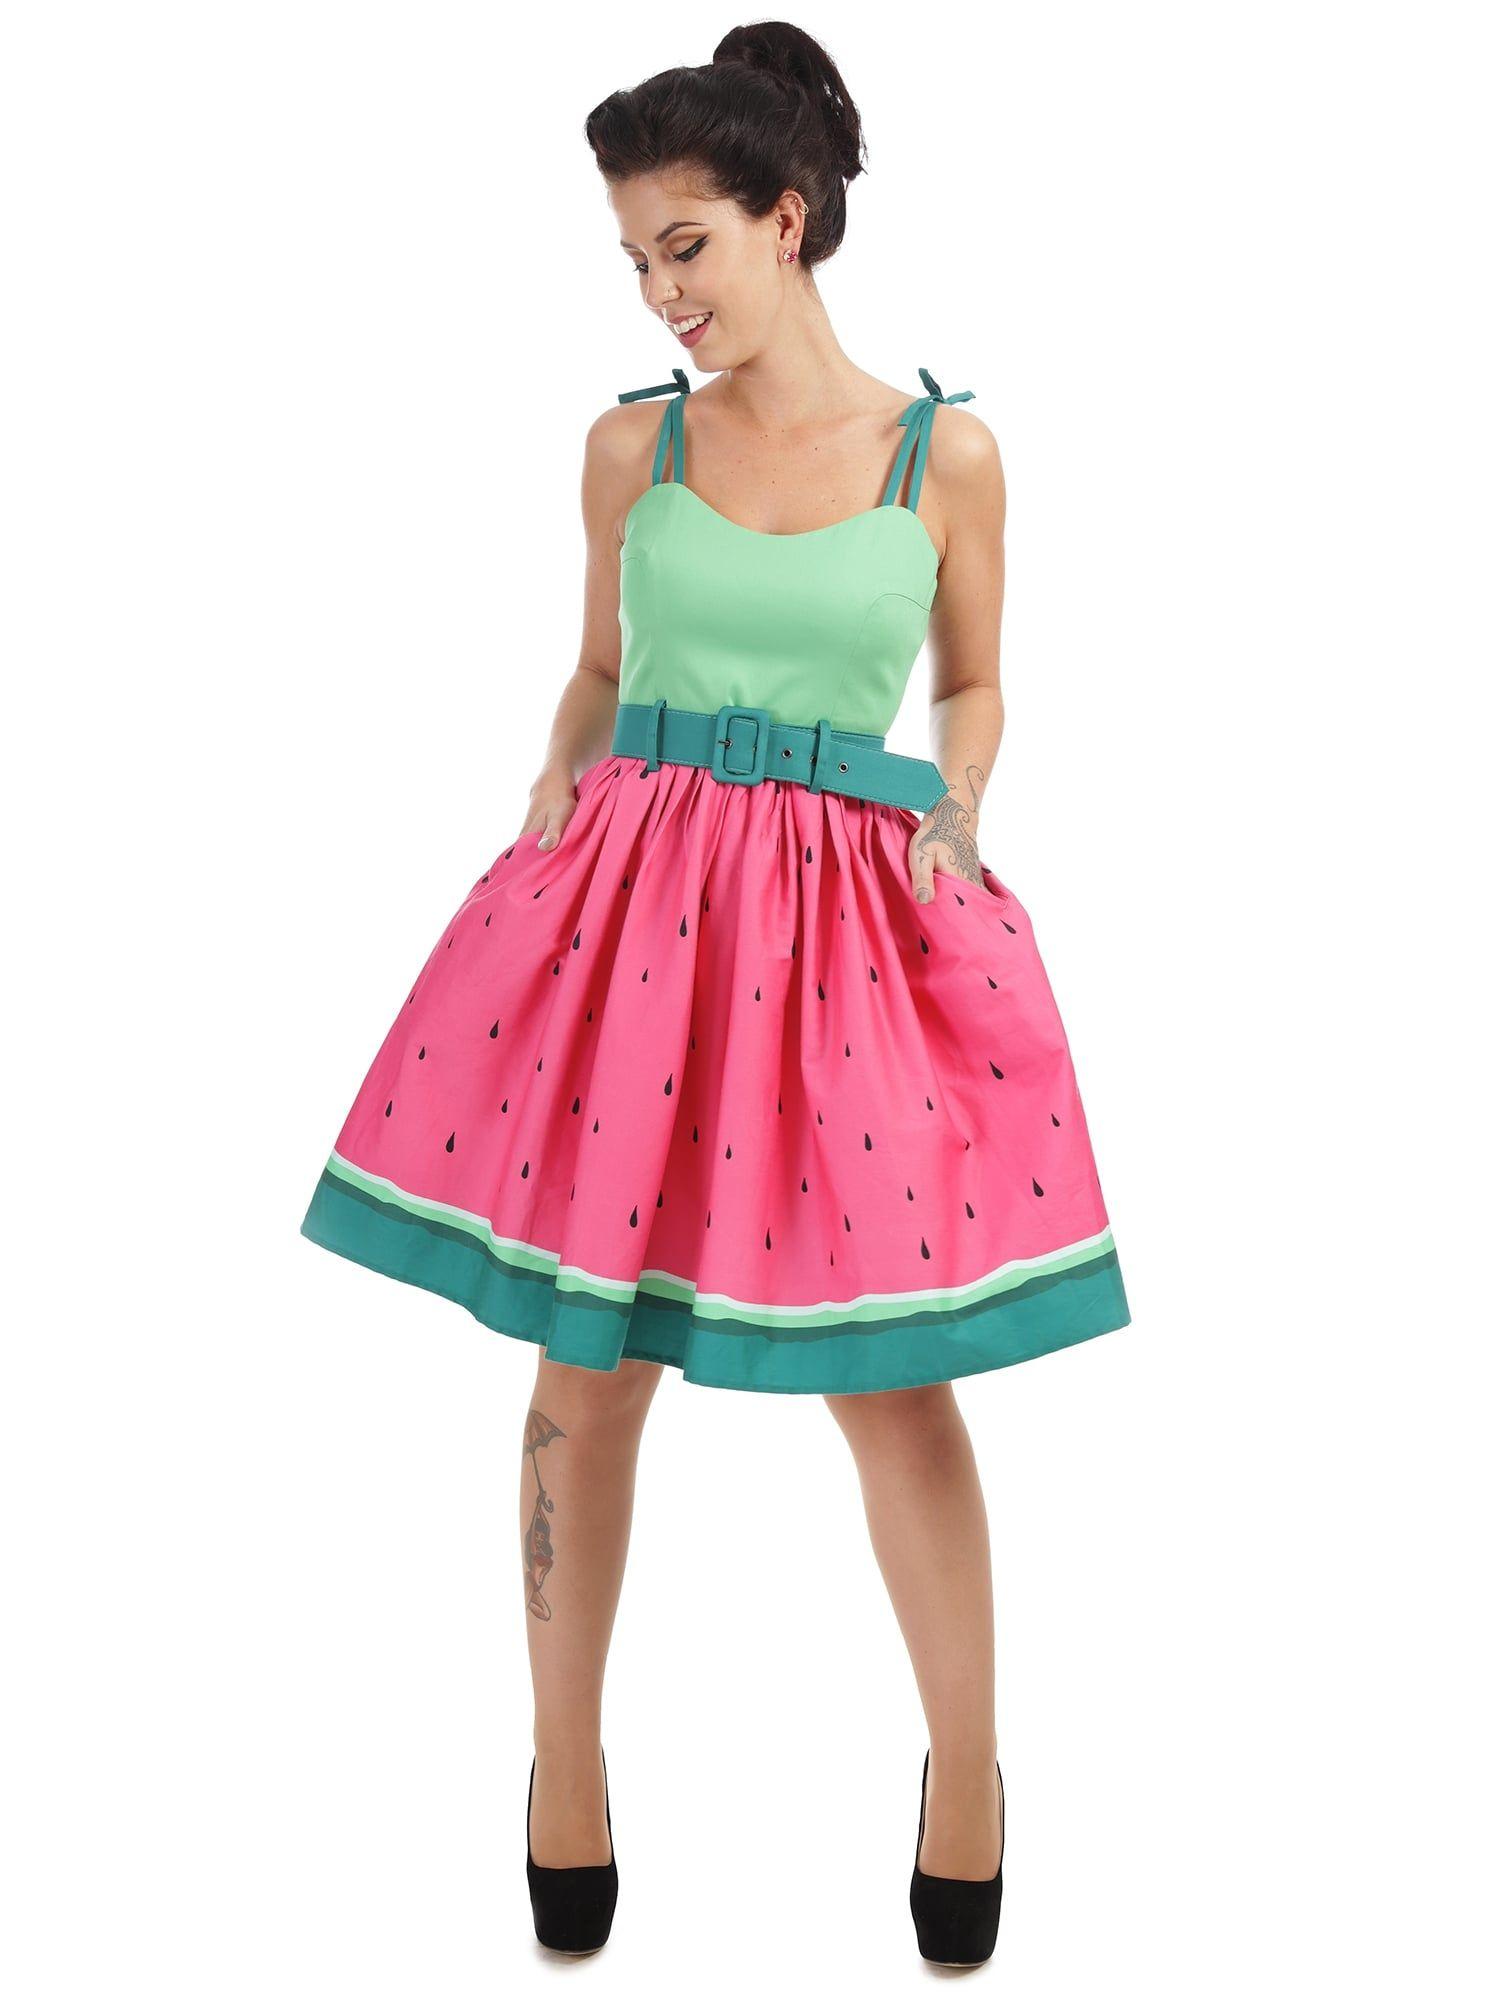 Collectif Mainline Jade Watermelon Swing Dress - Collectif Mainline ...